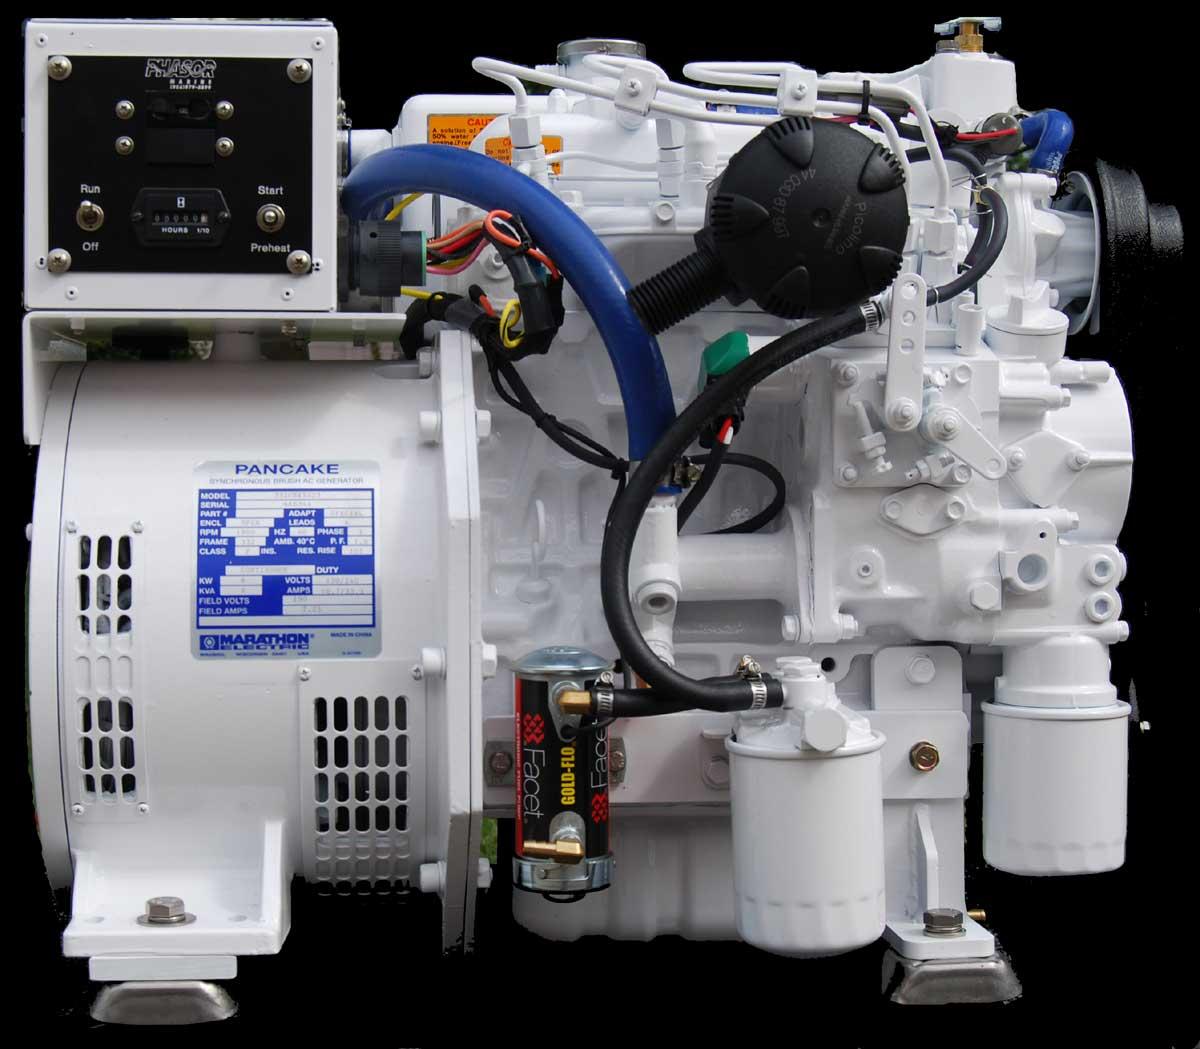 Kohler Marine Generator Parts Diagram 6 5 Sel: Phasor Marine Generators K3-6.5KW